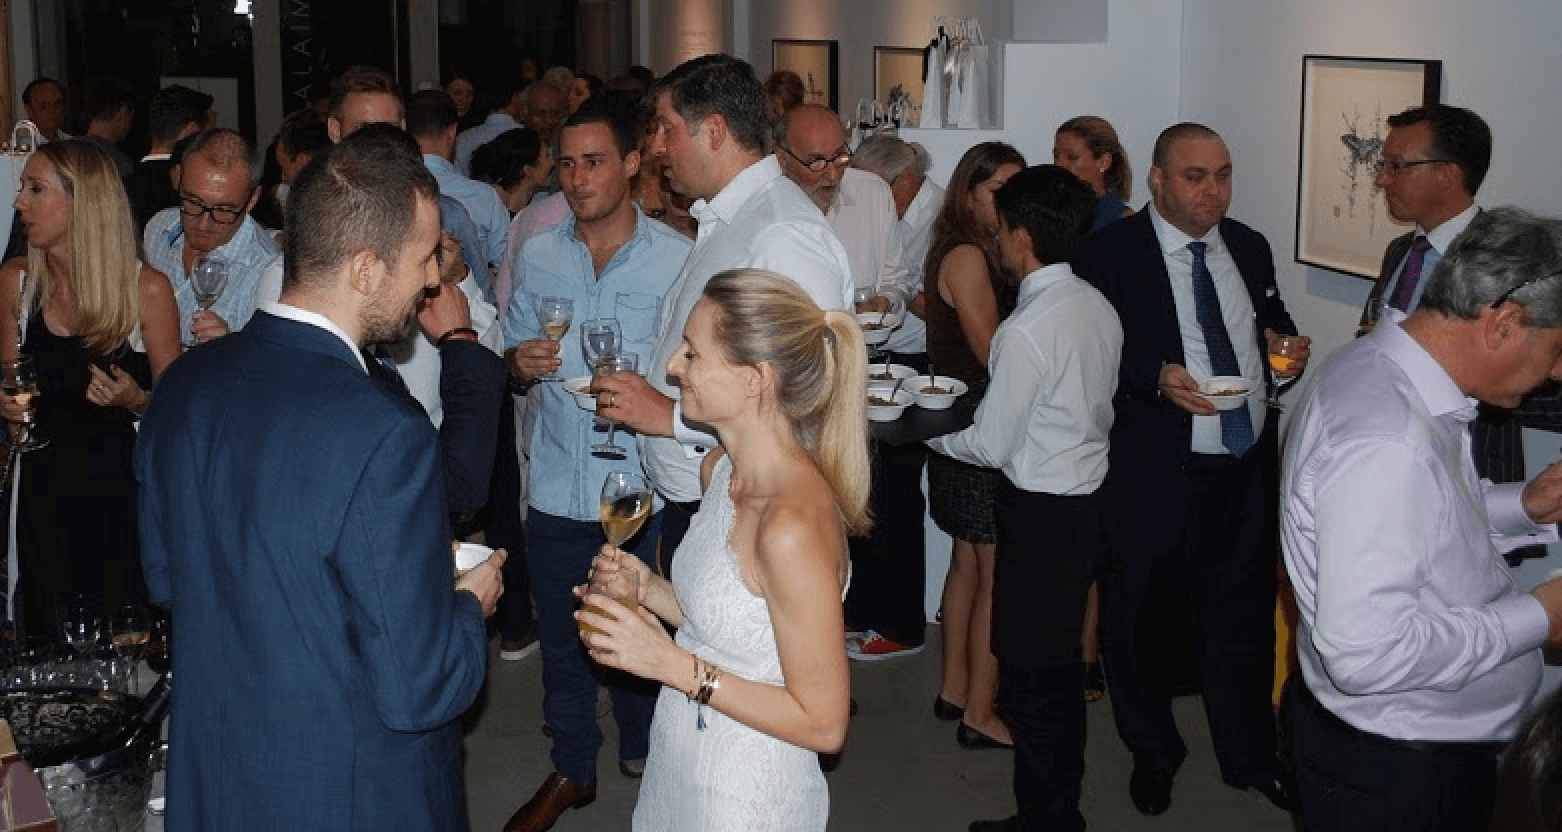 Swiss Association Wine Tasting event